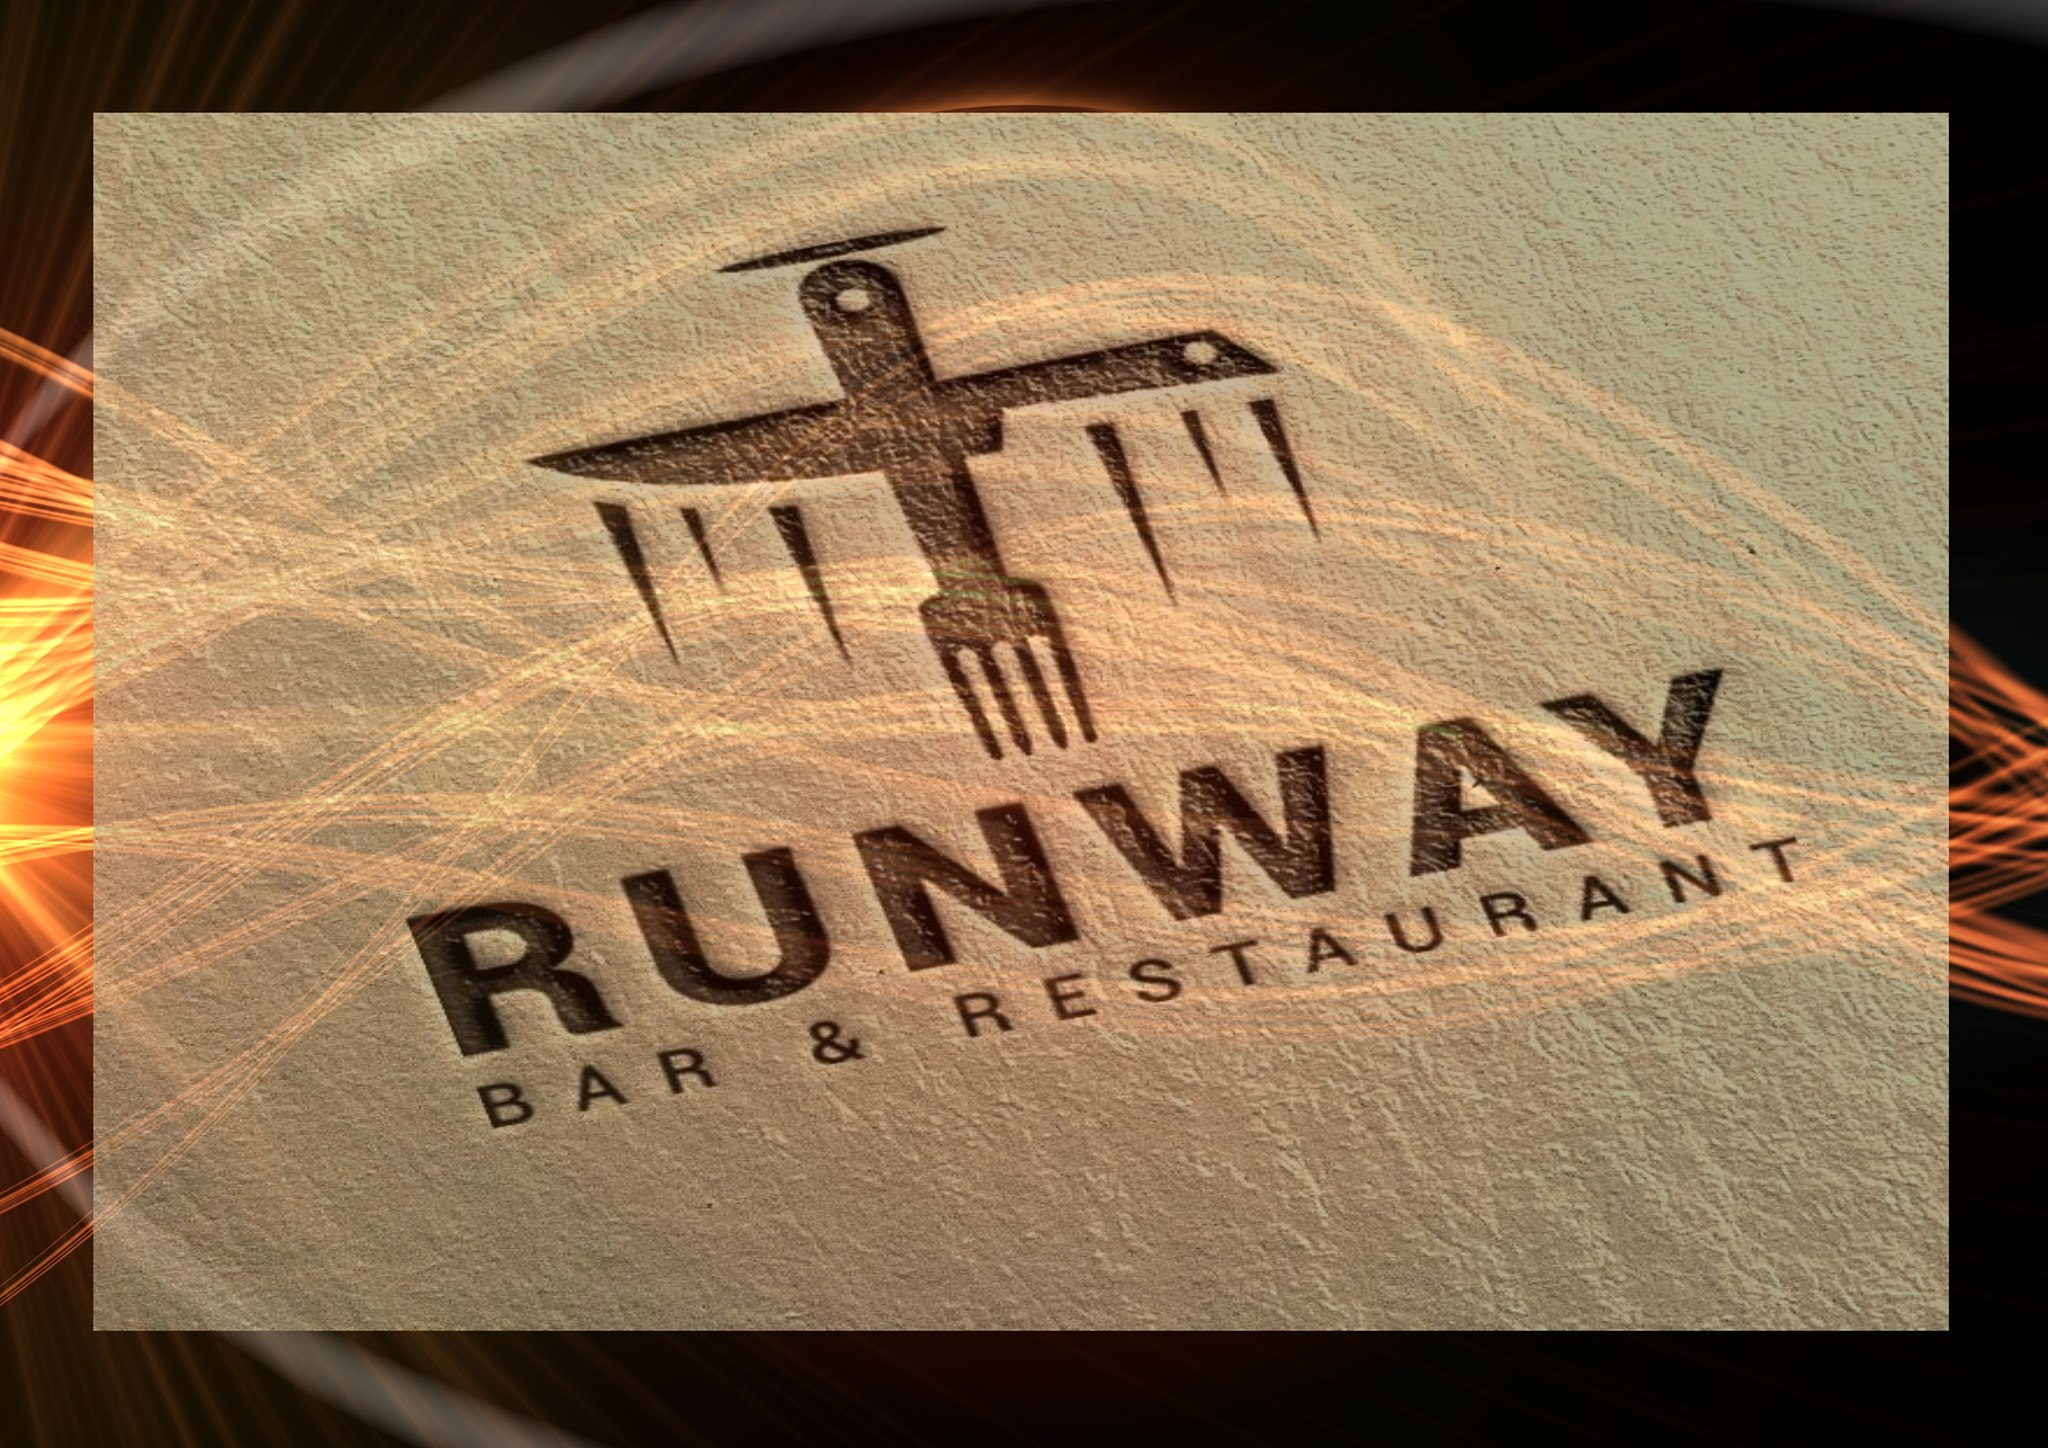 runway bar.jpg